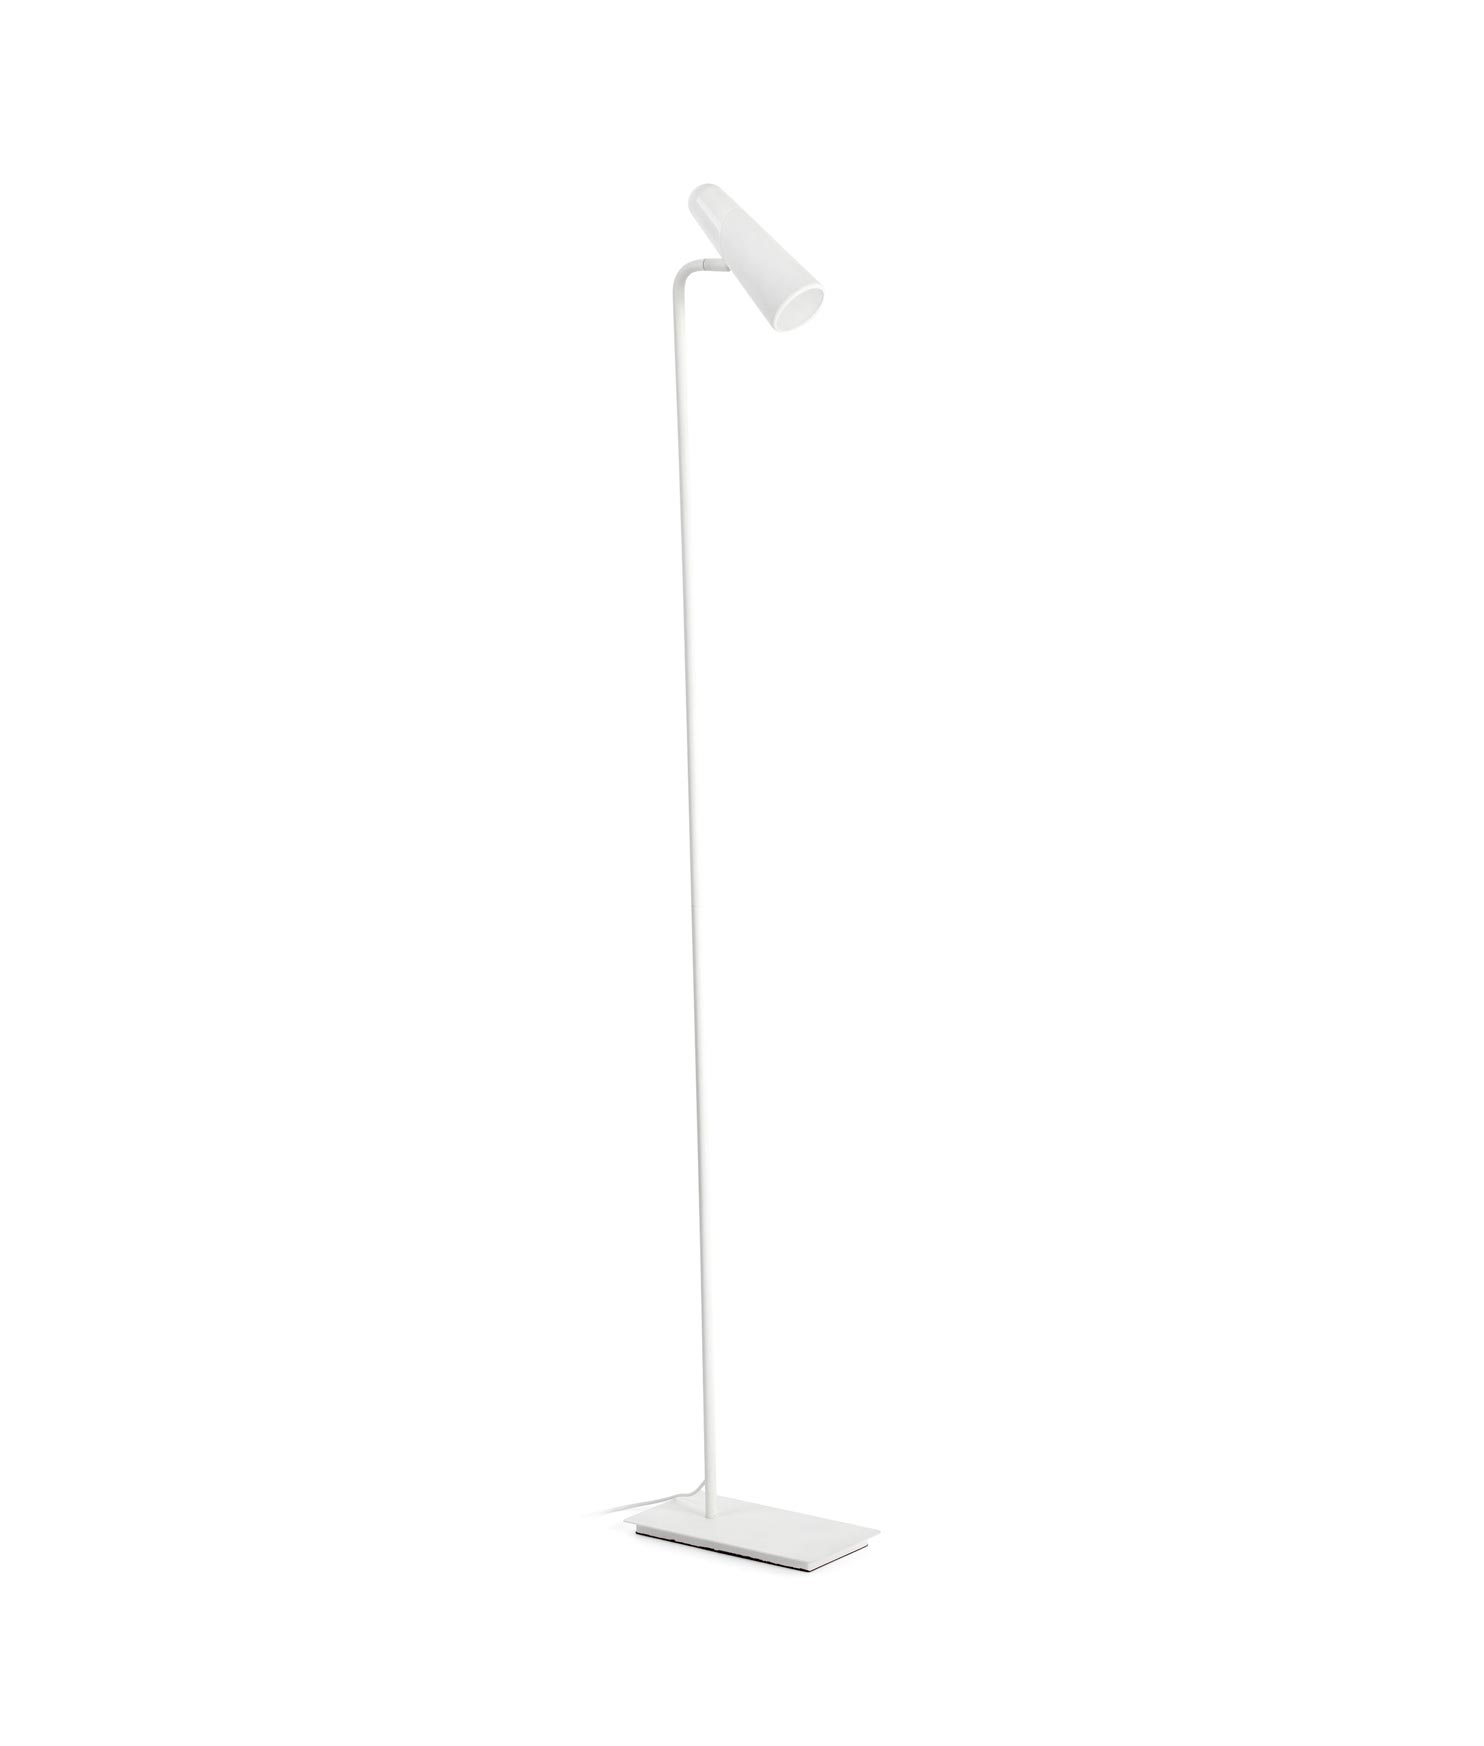 Lámpara salón minimalista blanca LAO LED